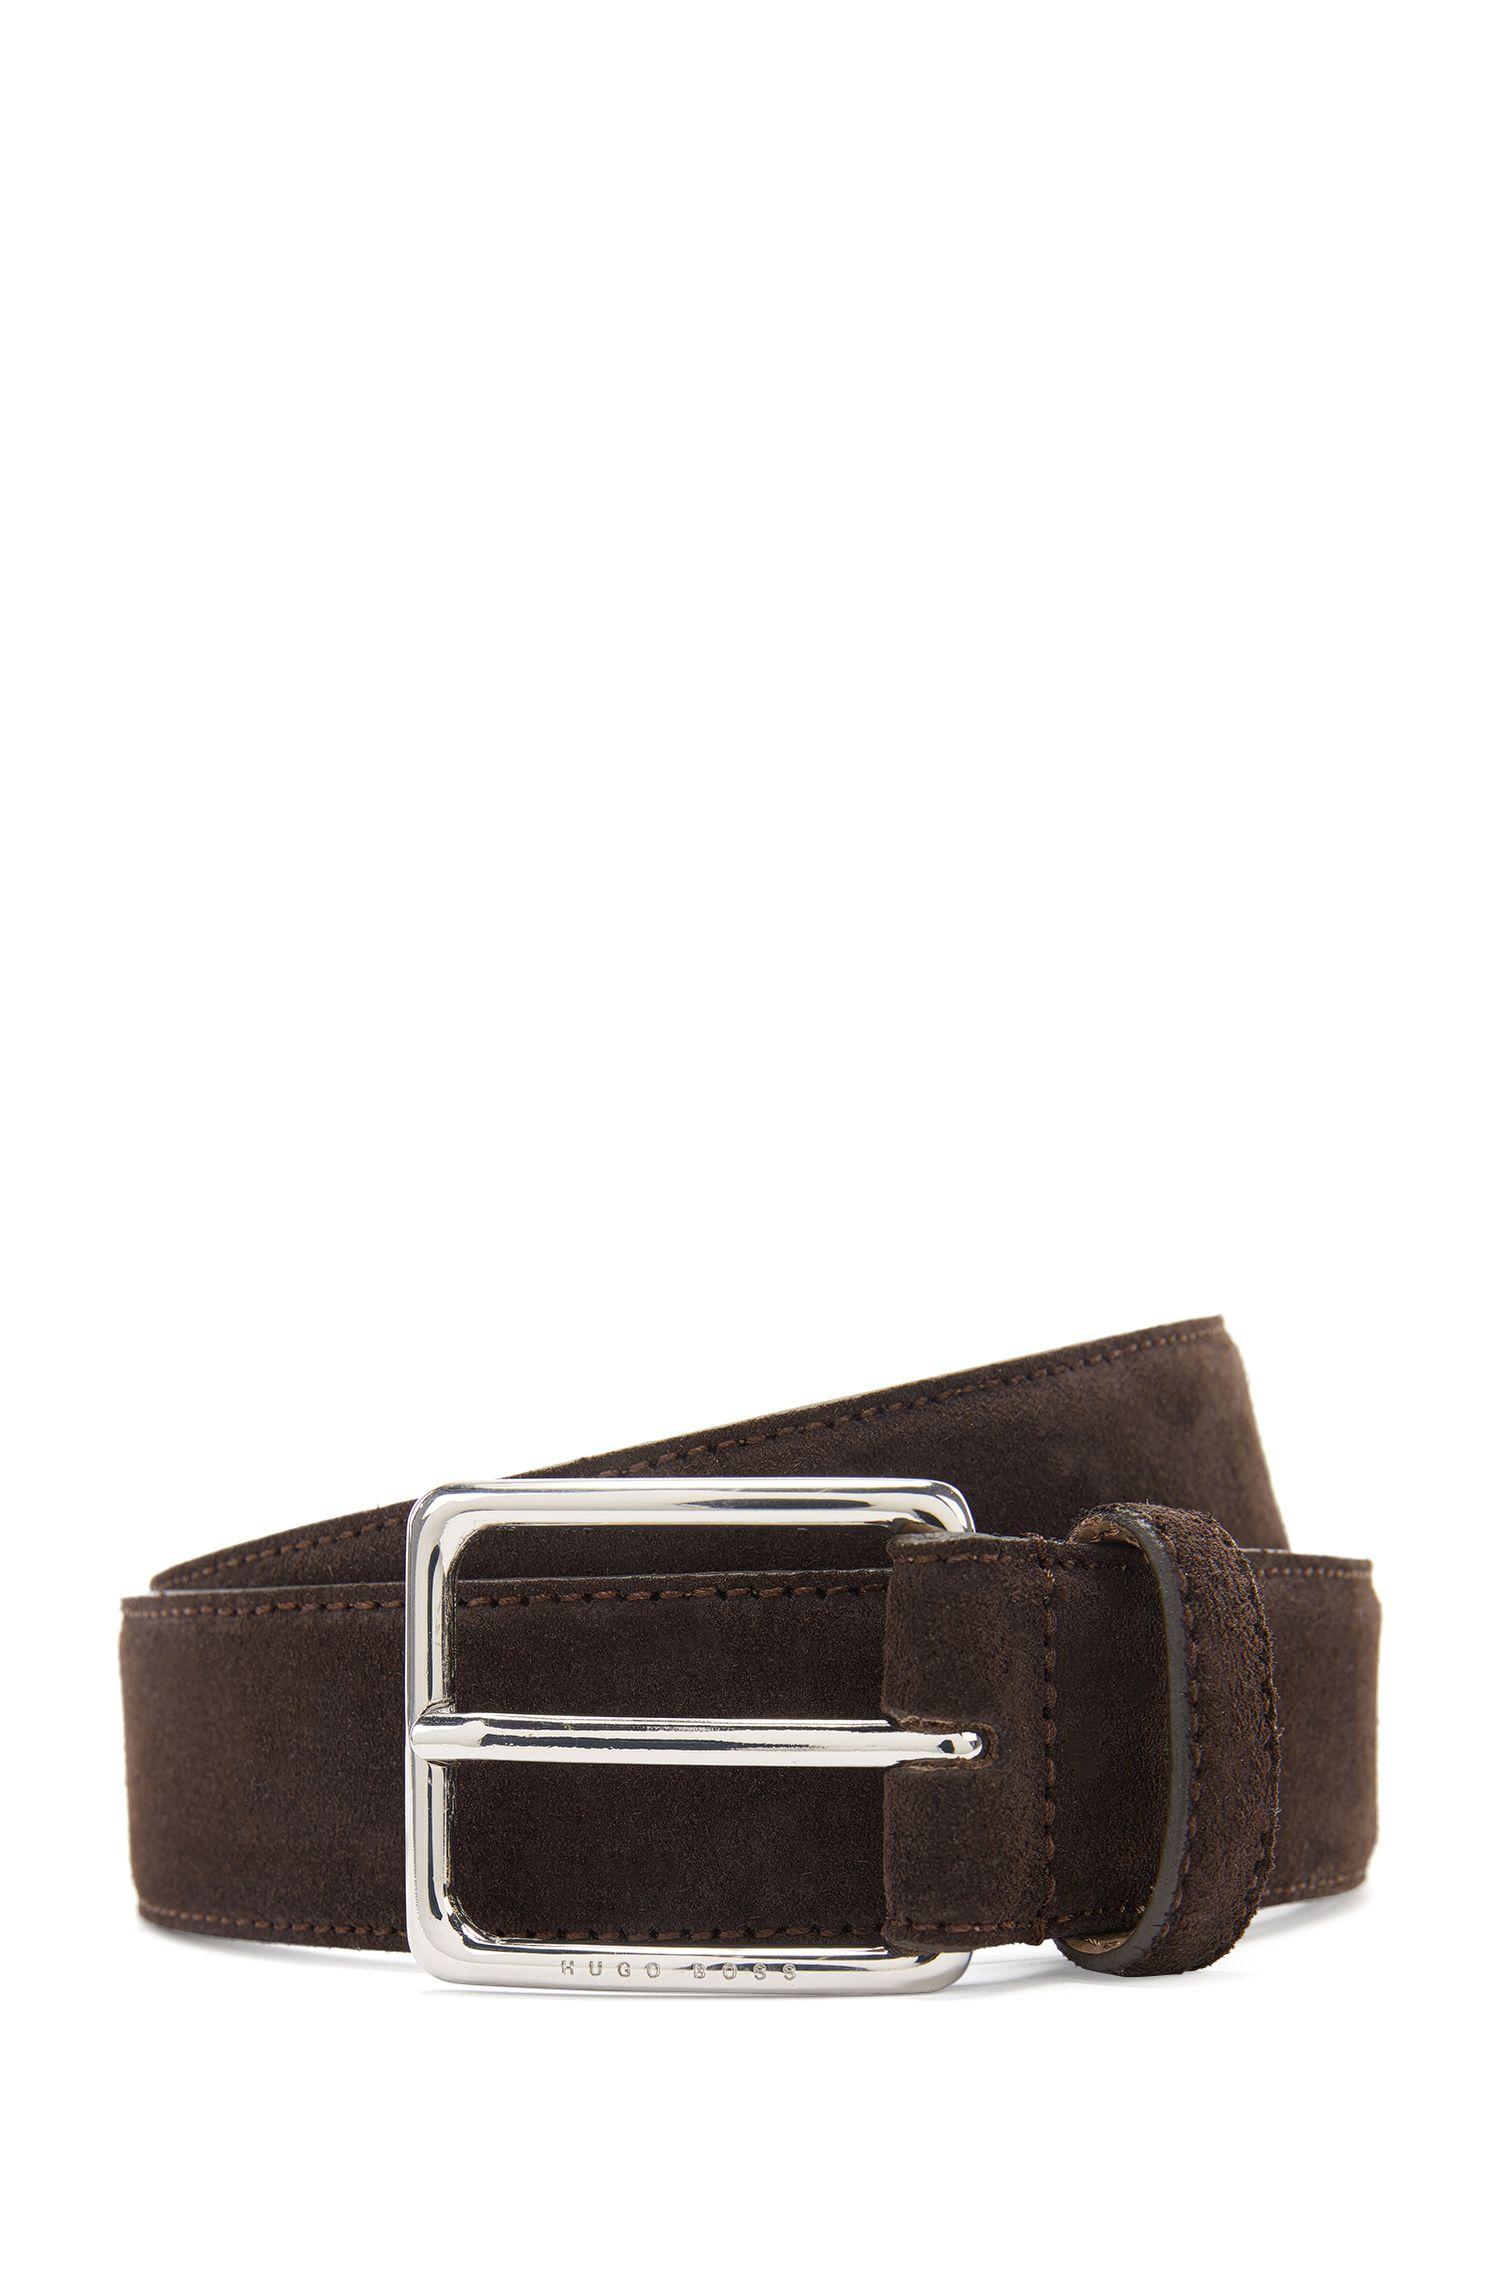 'Catioso Sz Sdpl' | Suede Leather Belt